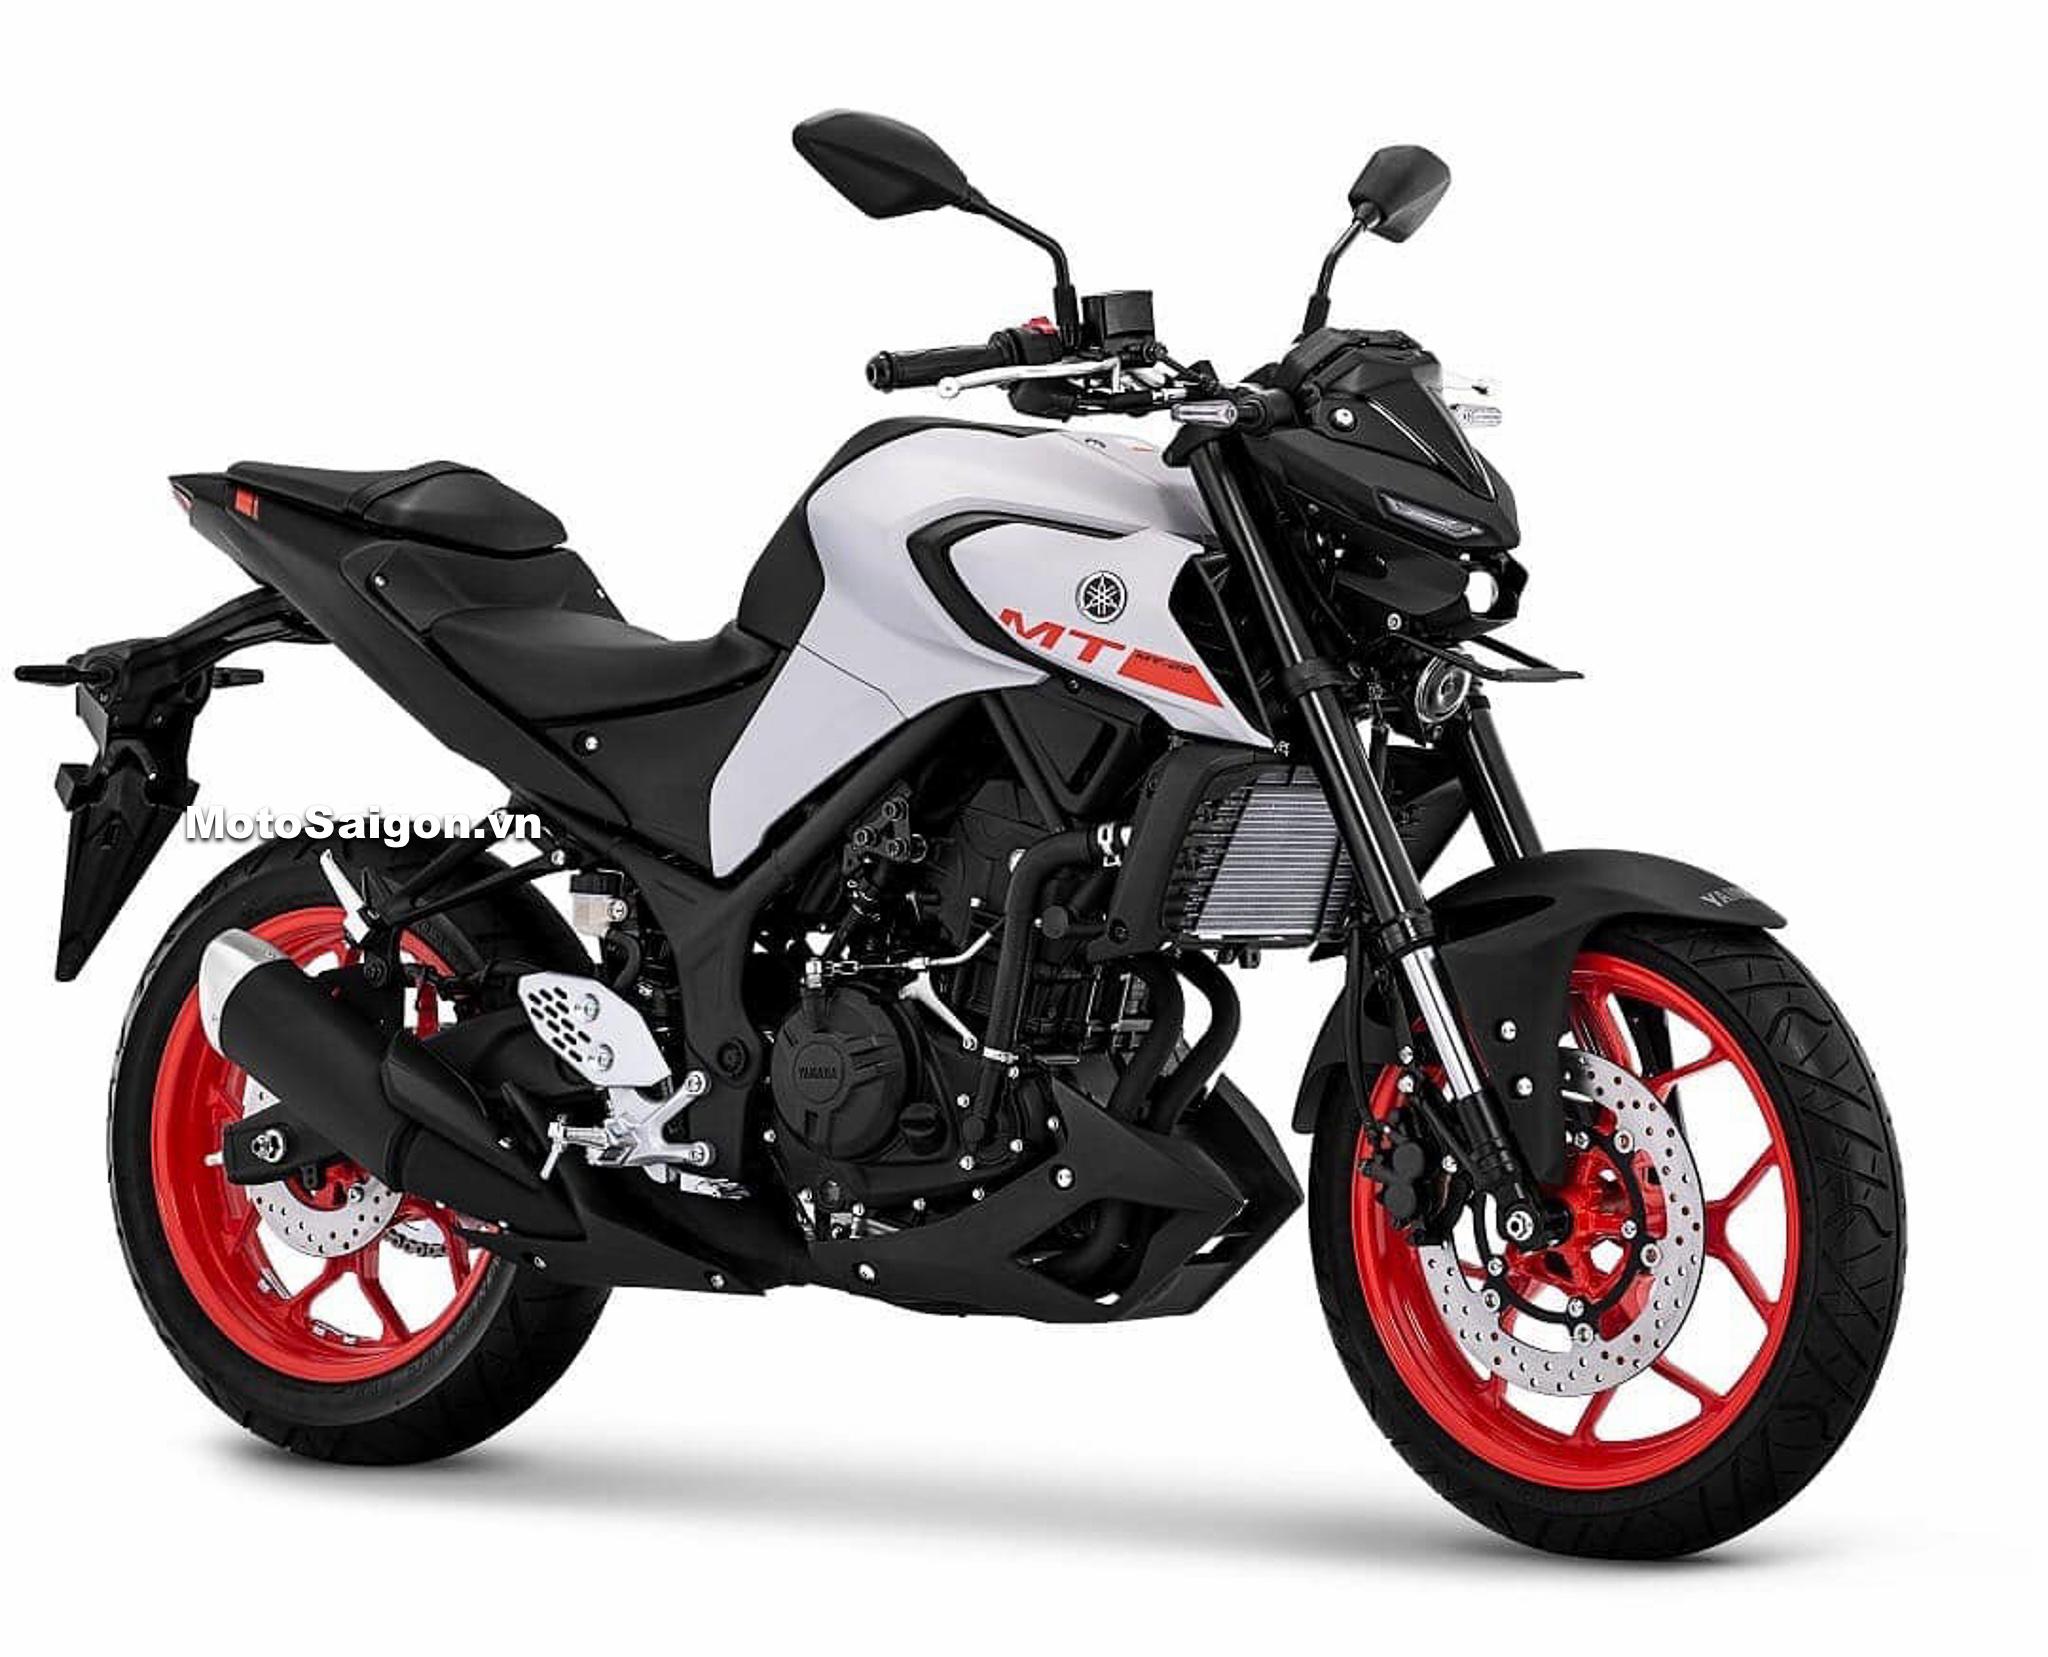 Yamaha MT-25 2020 tương tự MT-03 bất ngờ ra mắt kèm giá bán